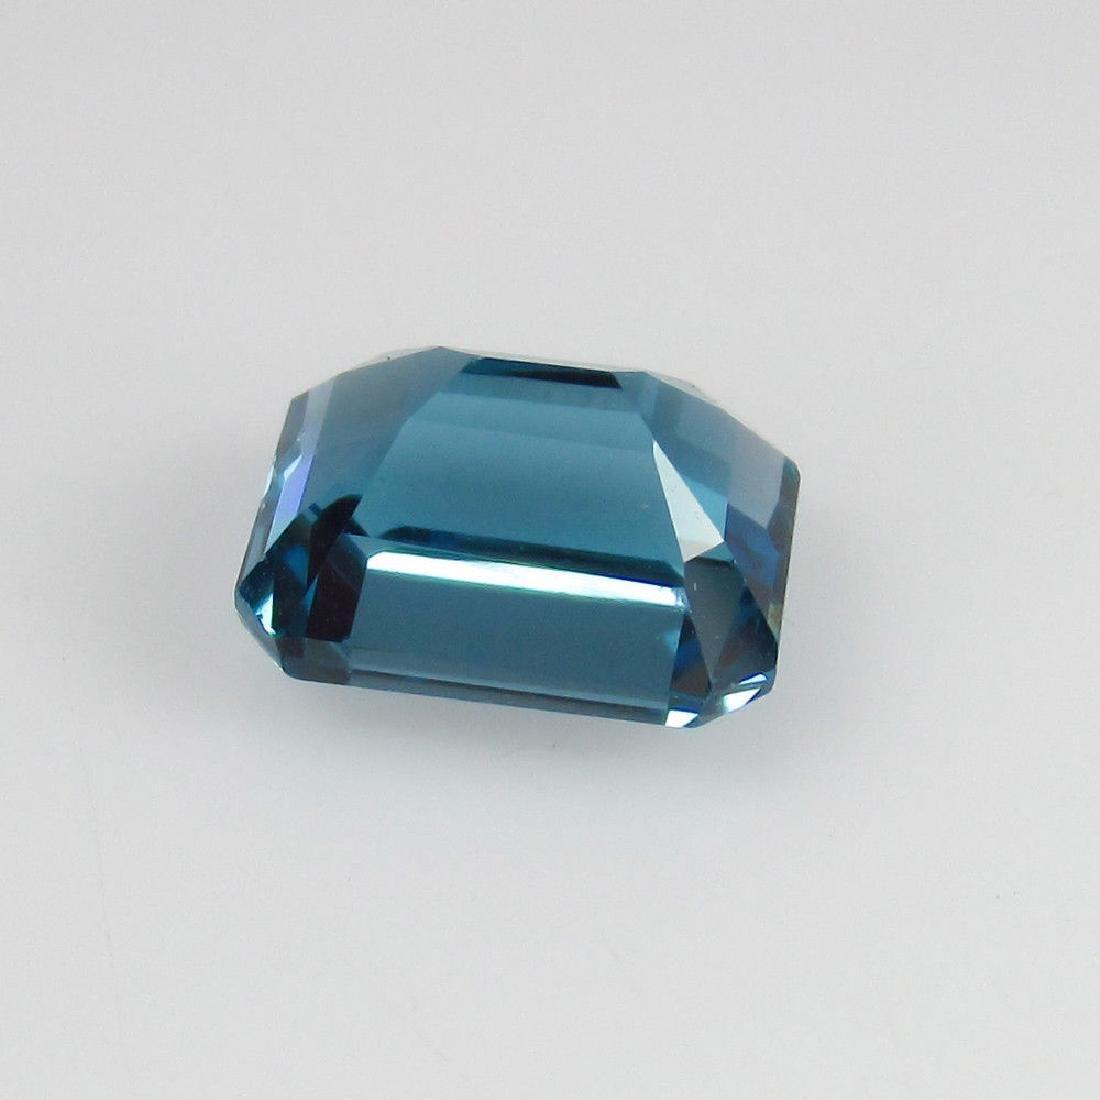 2.47 Ctw Natural Loose London Blue Topaz Emerald Cut - 2